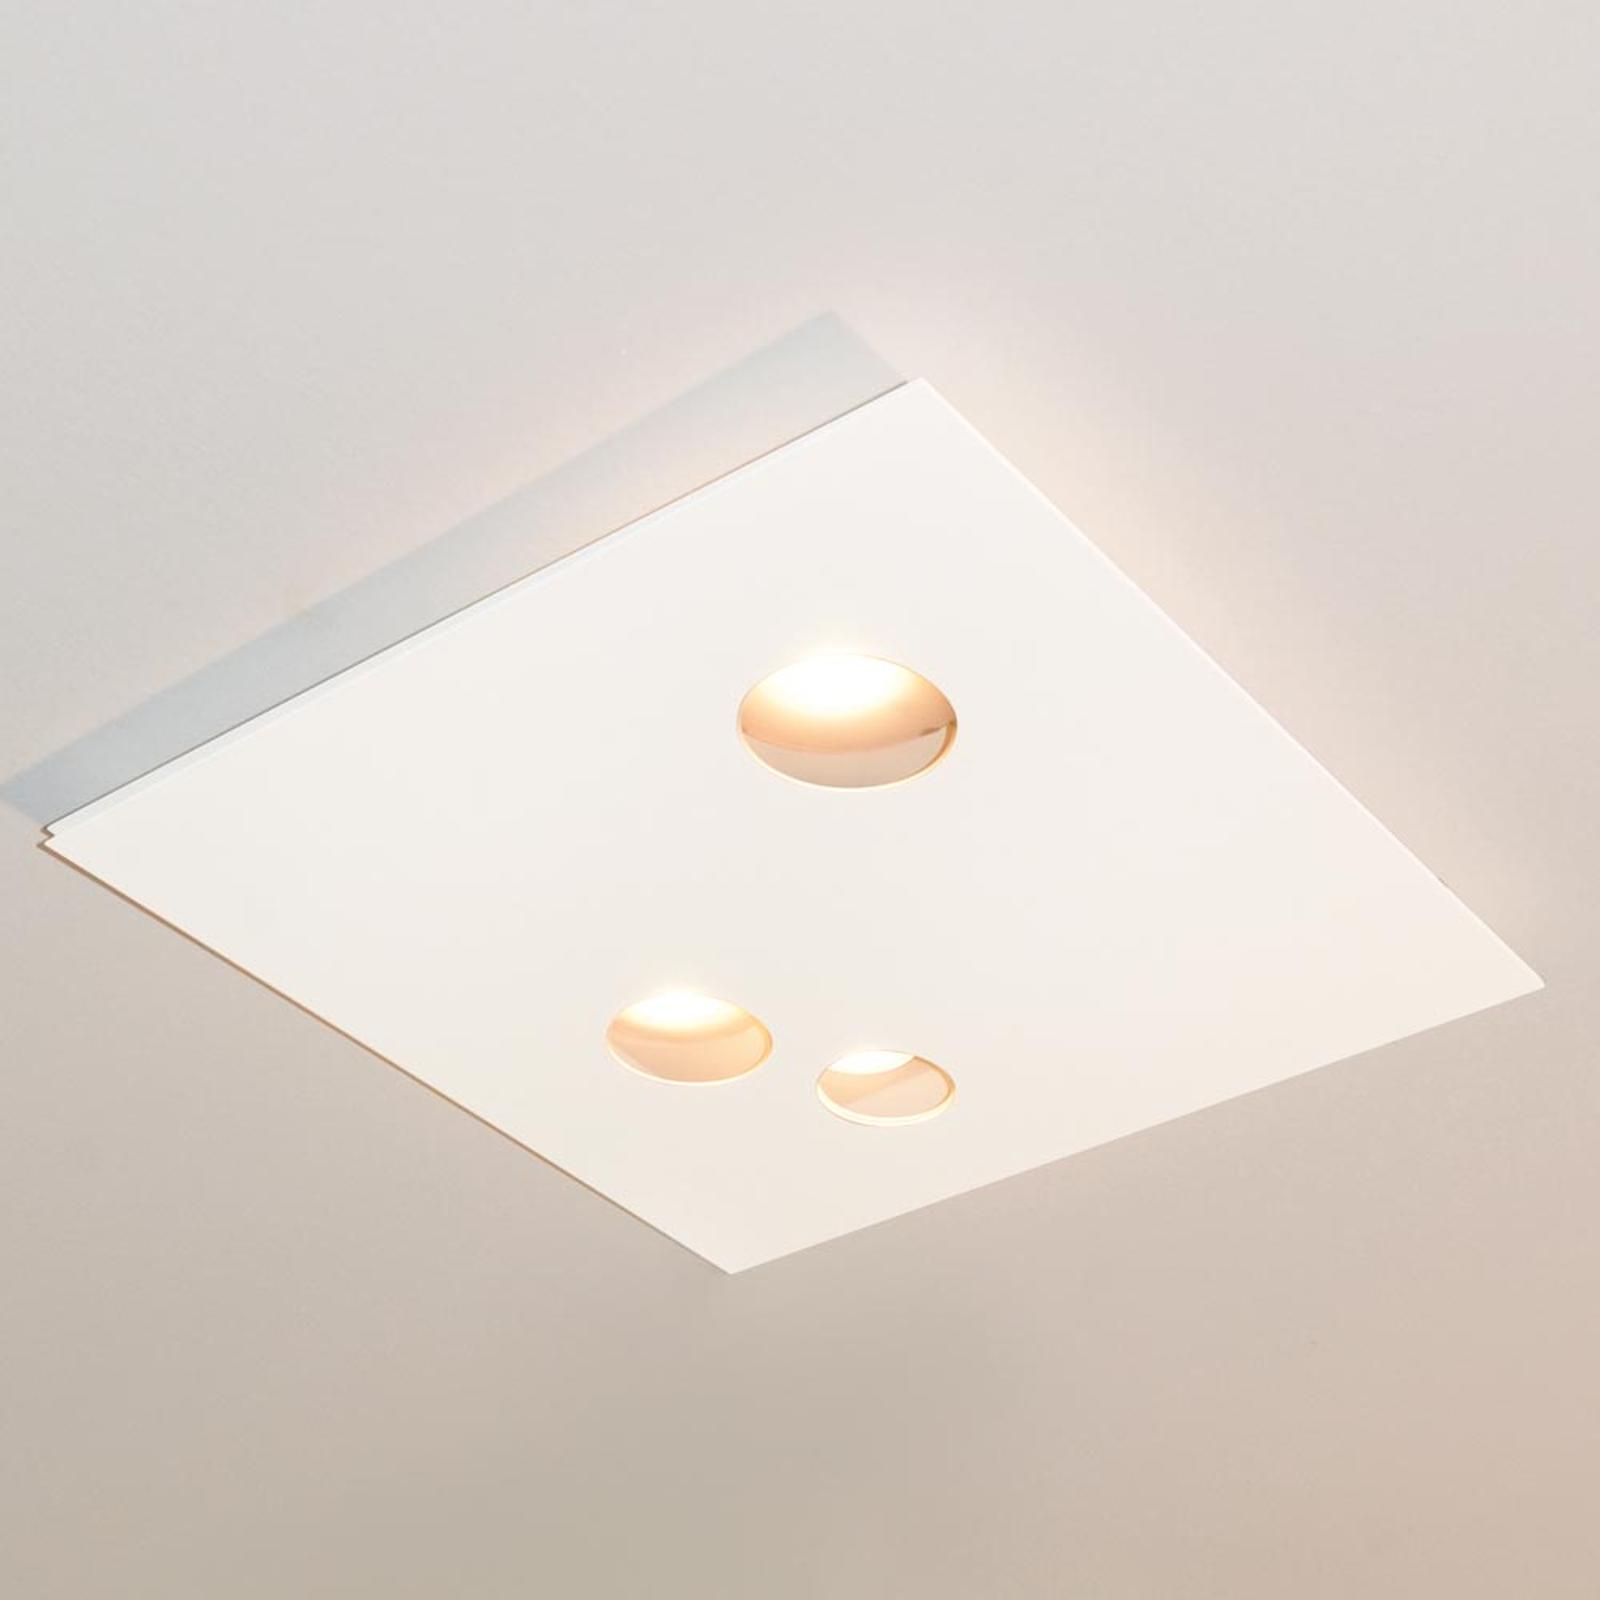 Knikerboker Des.agn LED-Deckenlampe, runde Löcher